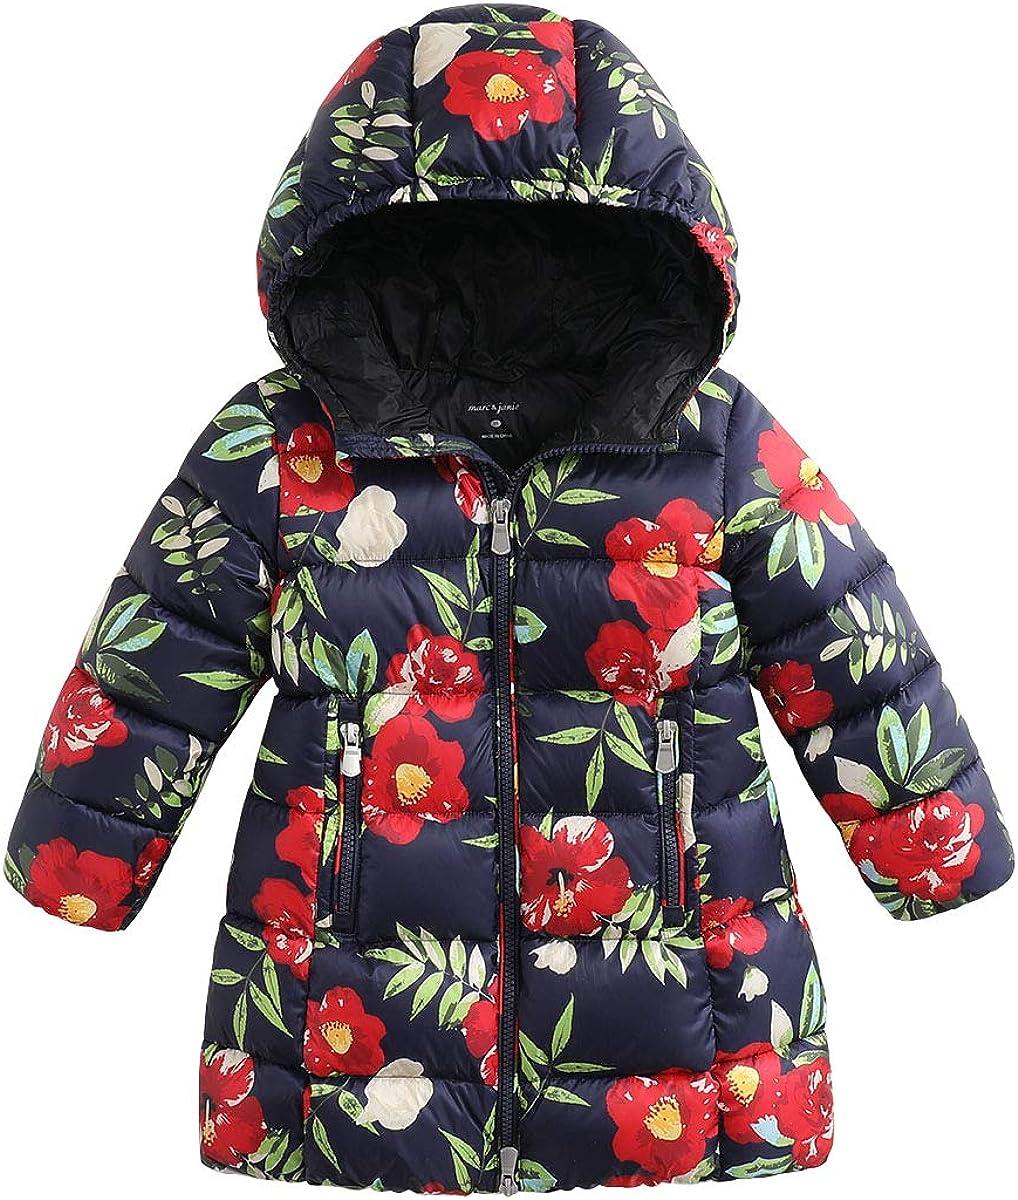 marc janie Girls' Long Light Weight Down Jacket Packable Hooded Down Puffer Coat